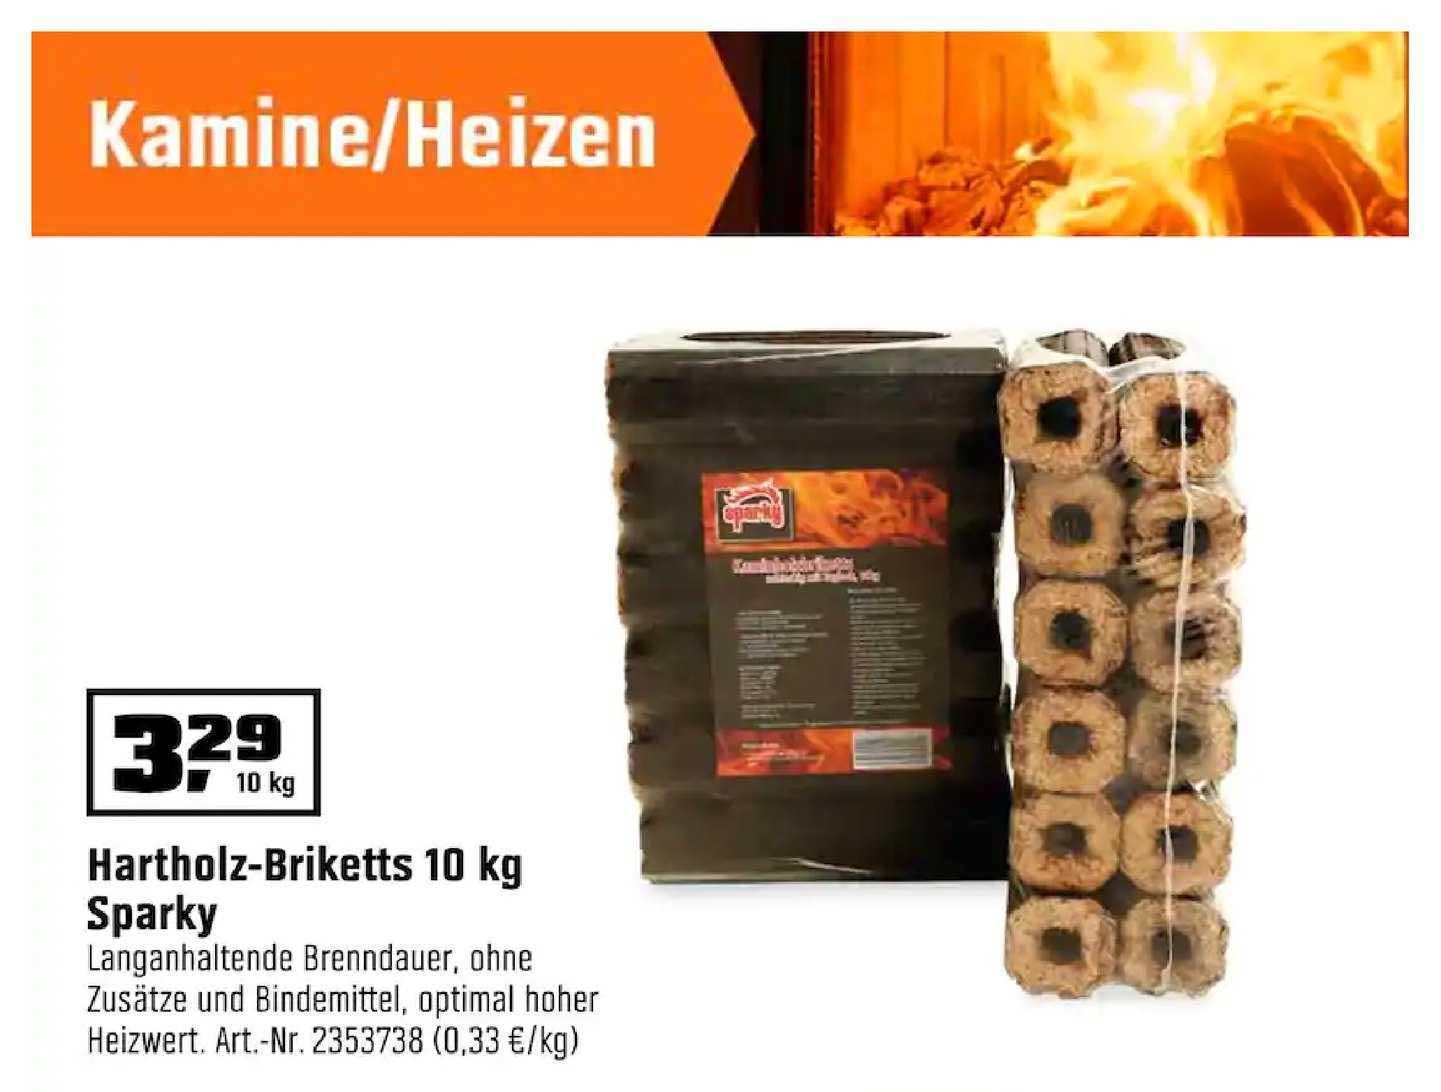 OBI Hartholz-briketts 10 Kg Sparky